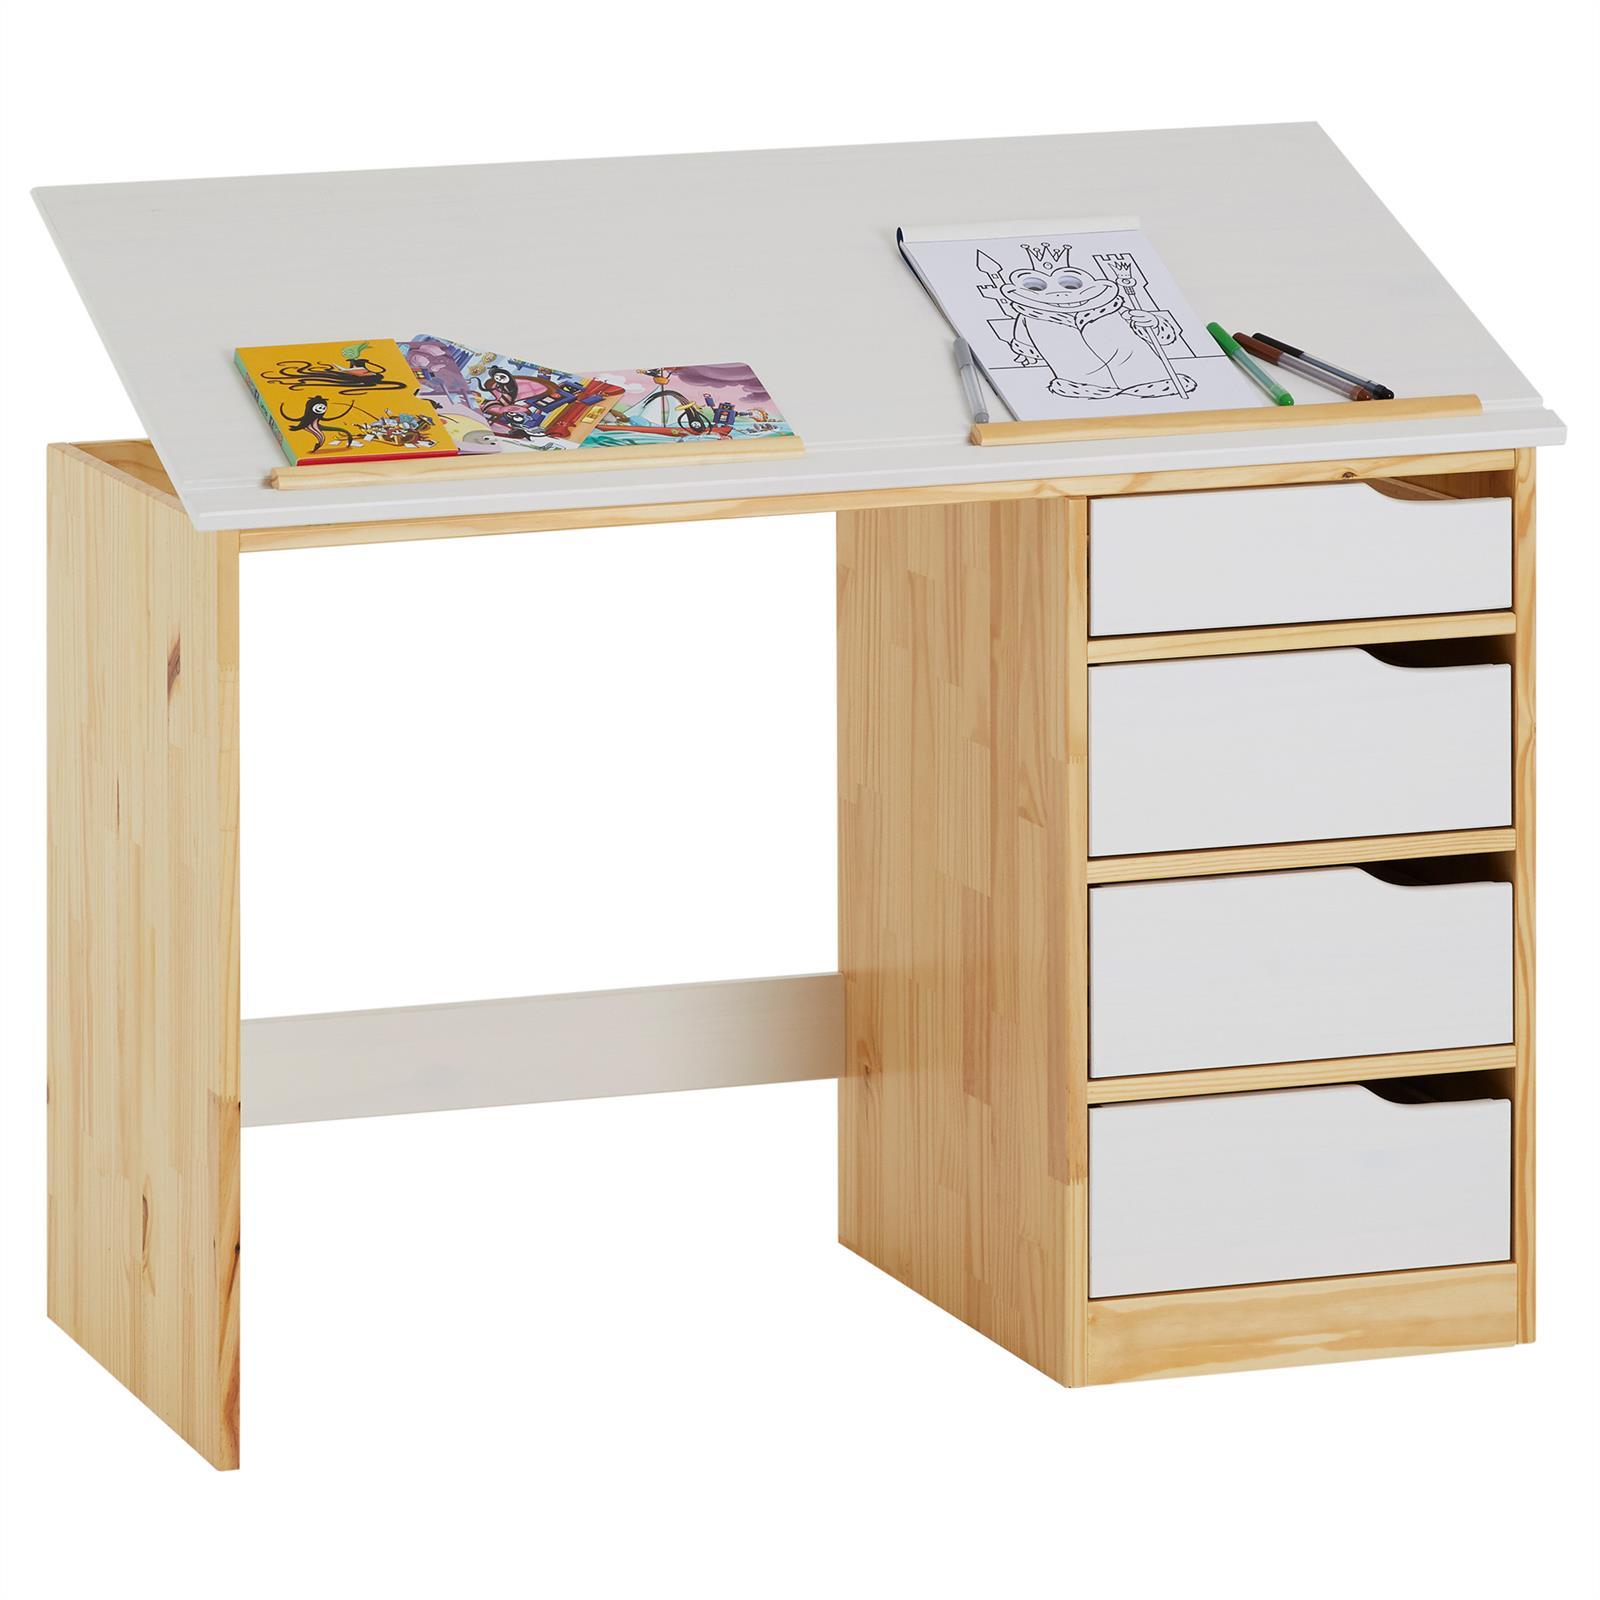 bureau enfant colier junior pupitre inclinable 4 tiroirs pin massif scandinave ebay. Black Bedroom Furniture Sets. Home Design Ideas